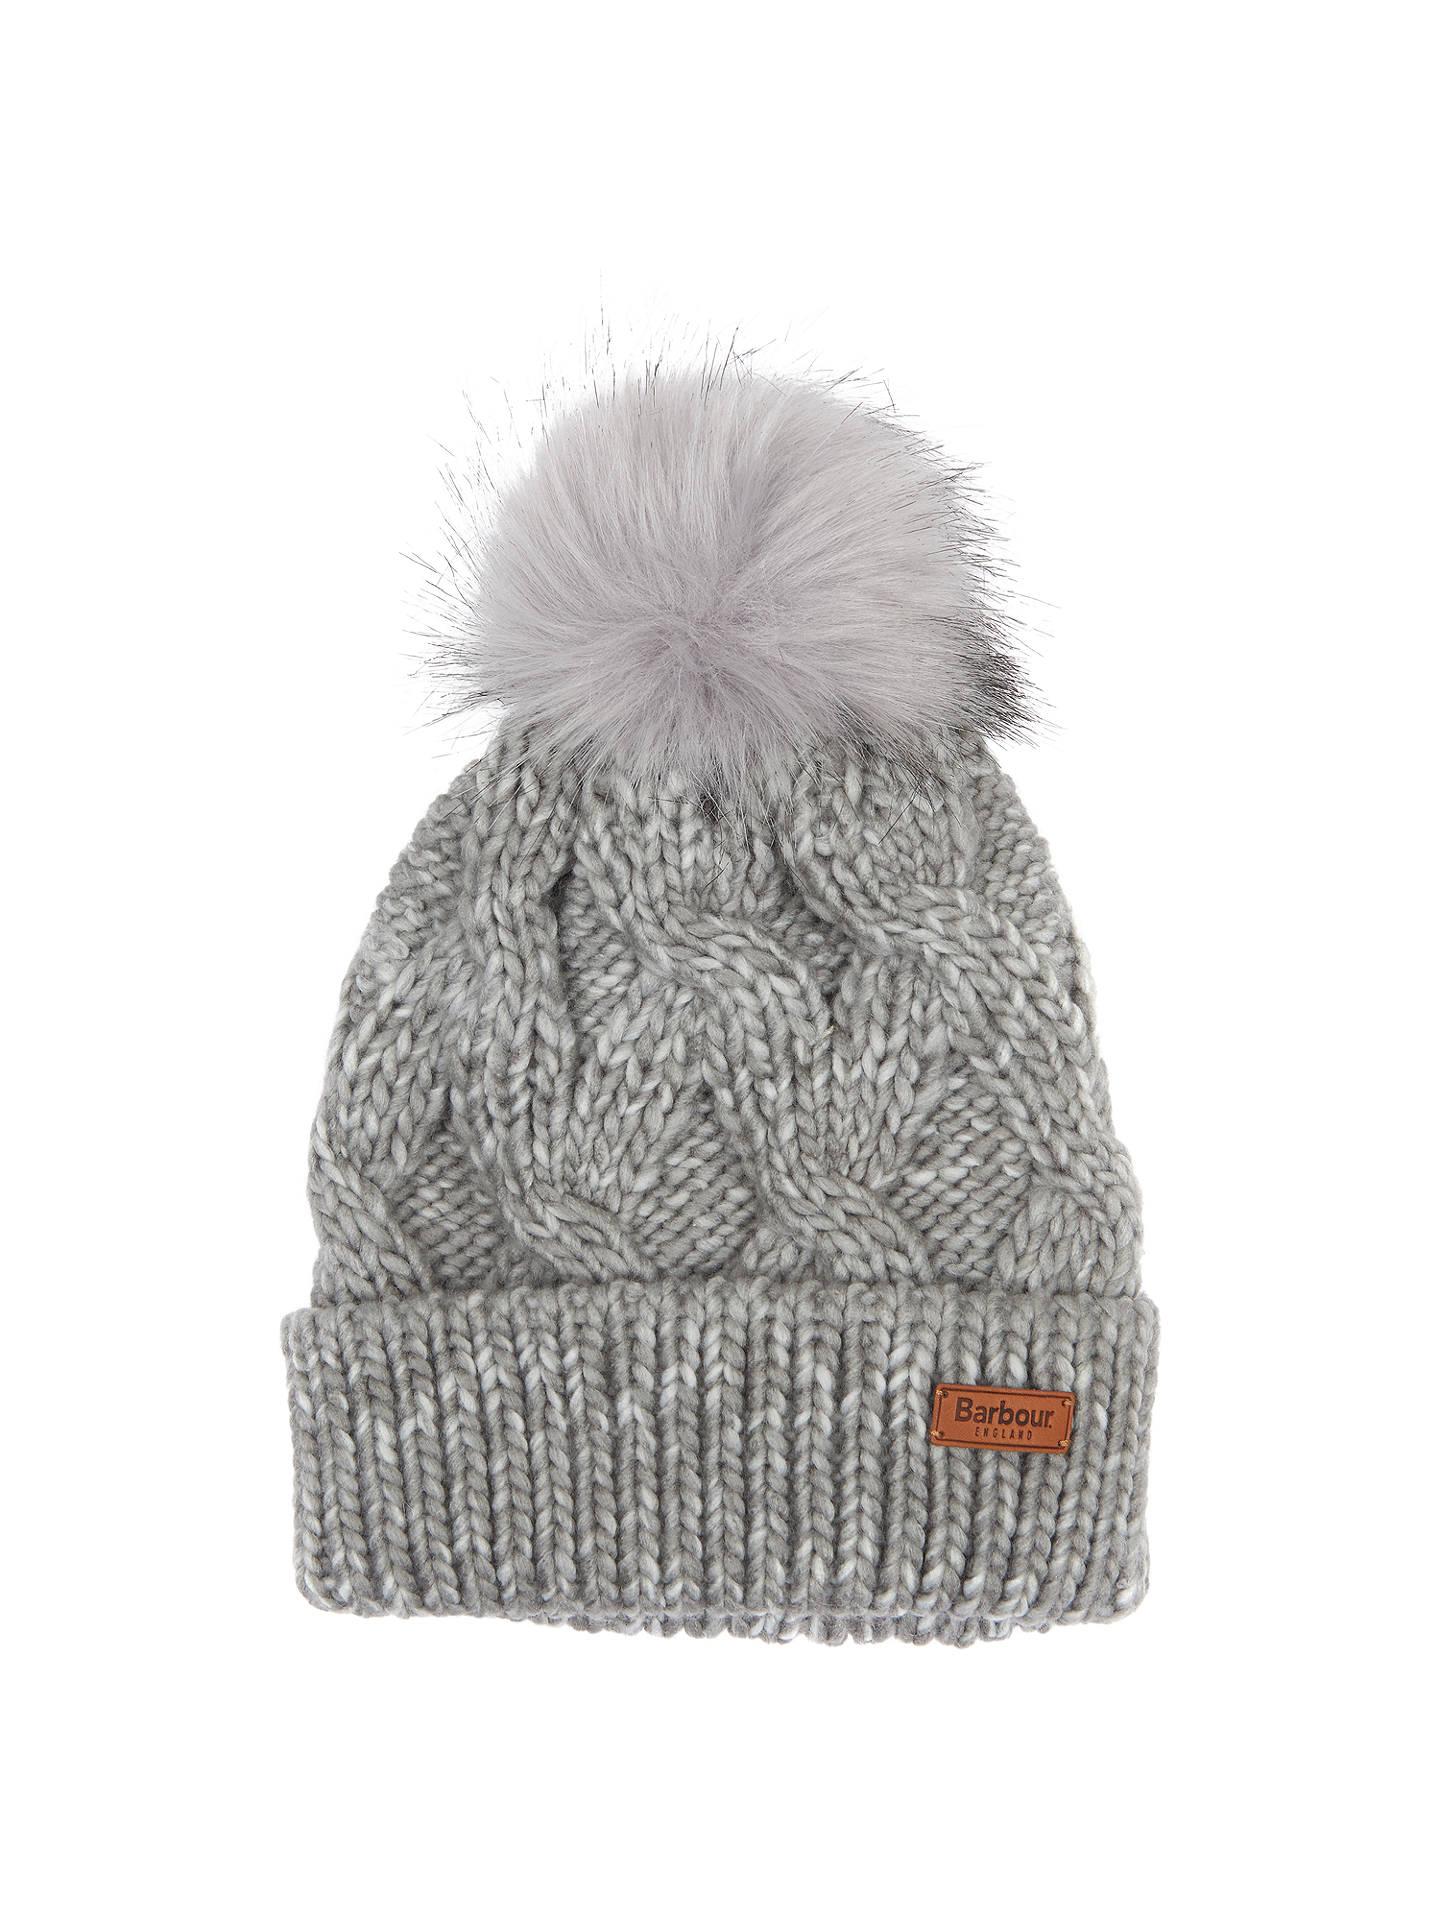 ef881e6fea675 Barbour Bridport Pom Beanie Hat